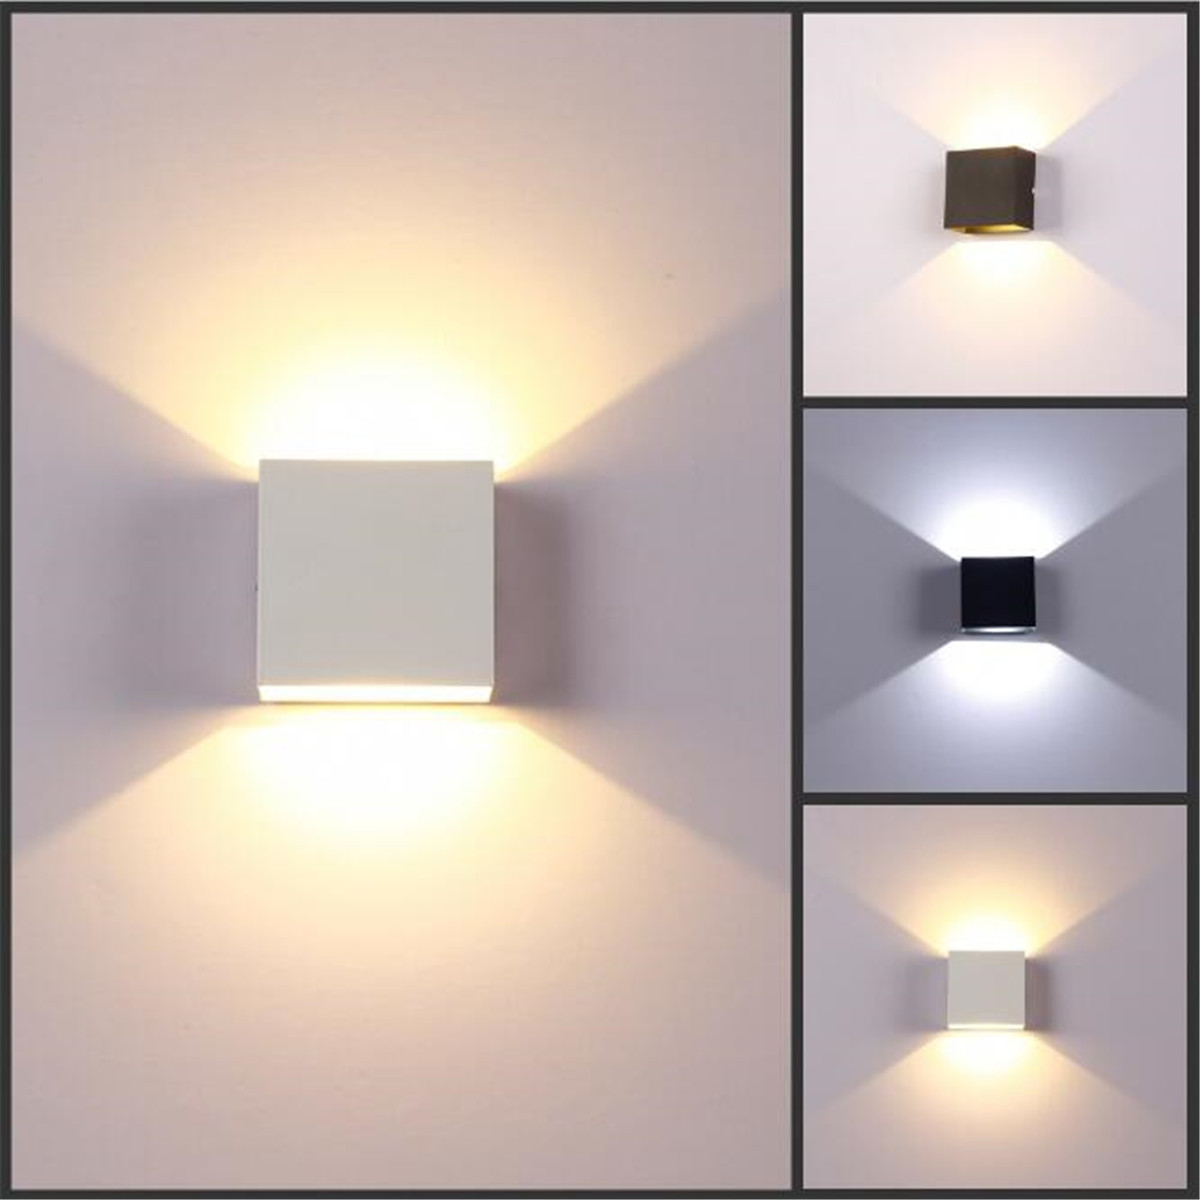 home wall lighting. Image Is Loading Modern-6W-LED-Wall-Light-Up-Down-Lamp- Home Wall Lighting